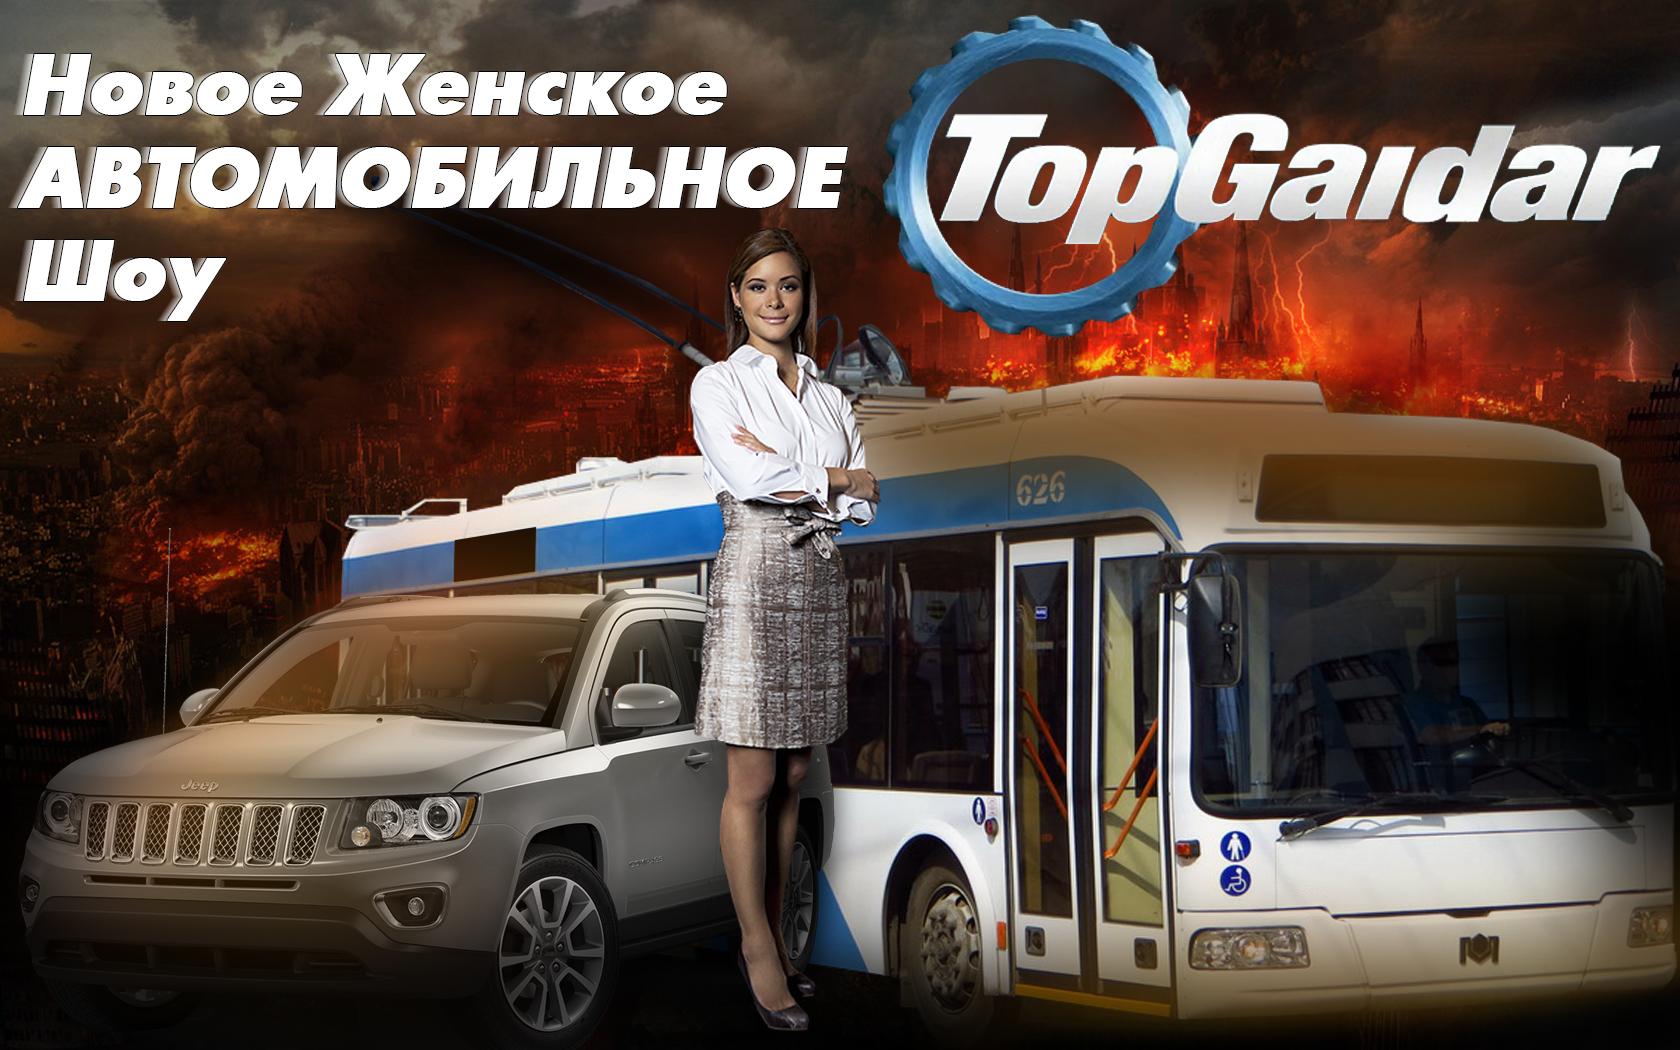 http://img-fotki.yandex.ru/get/6739/225452242.25/0_137344_8296f8c7_orig